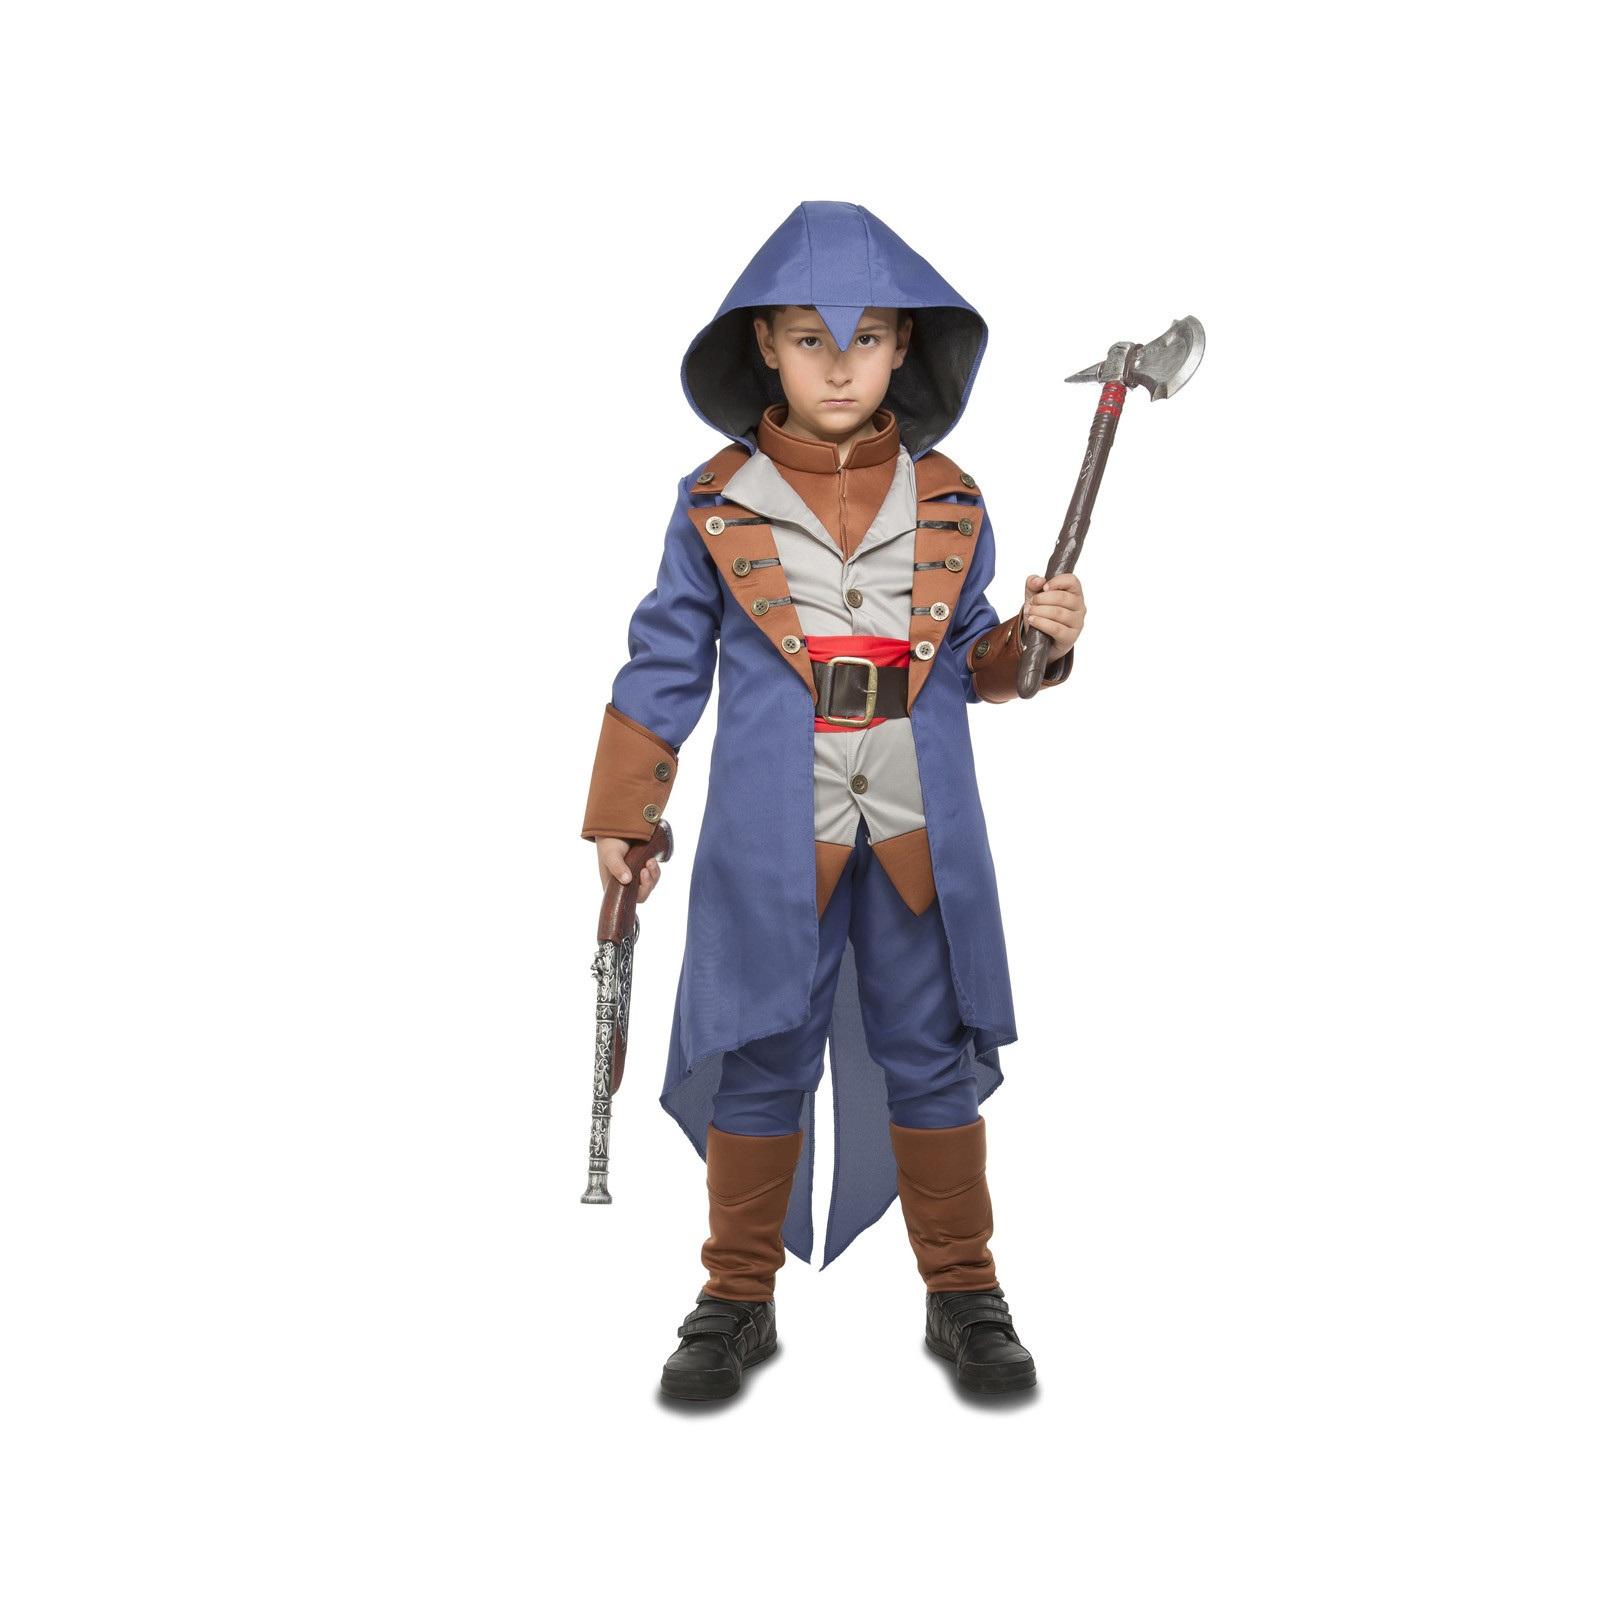 disfraz el asesino azul niño 203950mom - DISFRAZ DEL ASESINO AZUL NIÑO